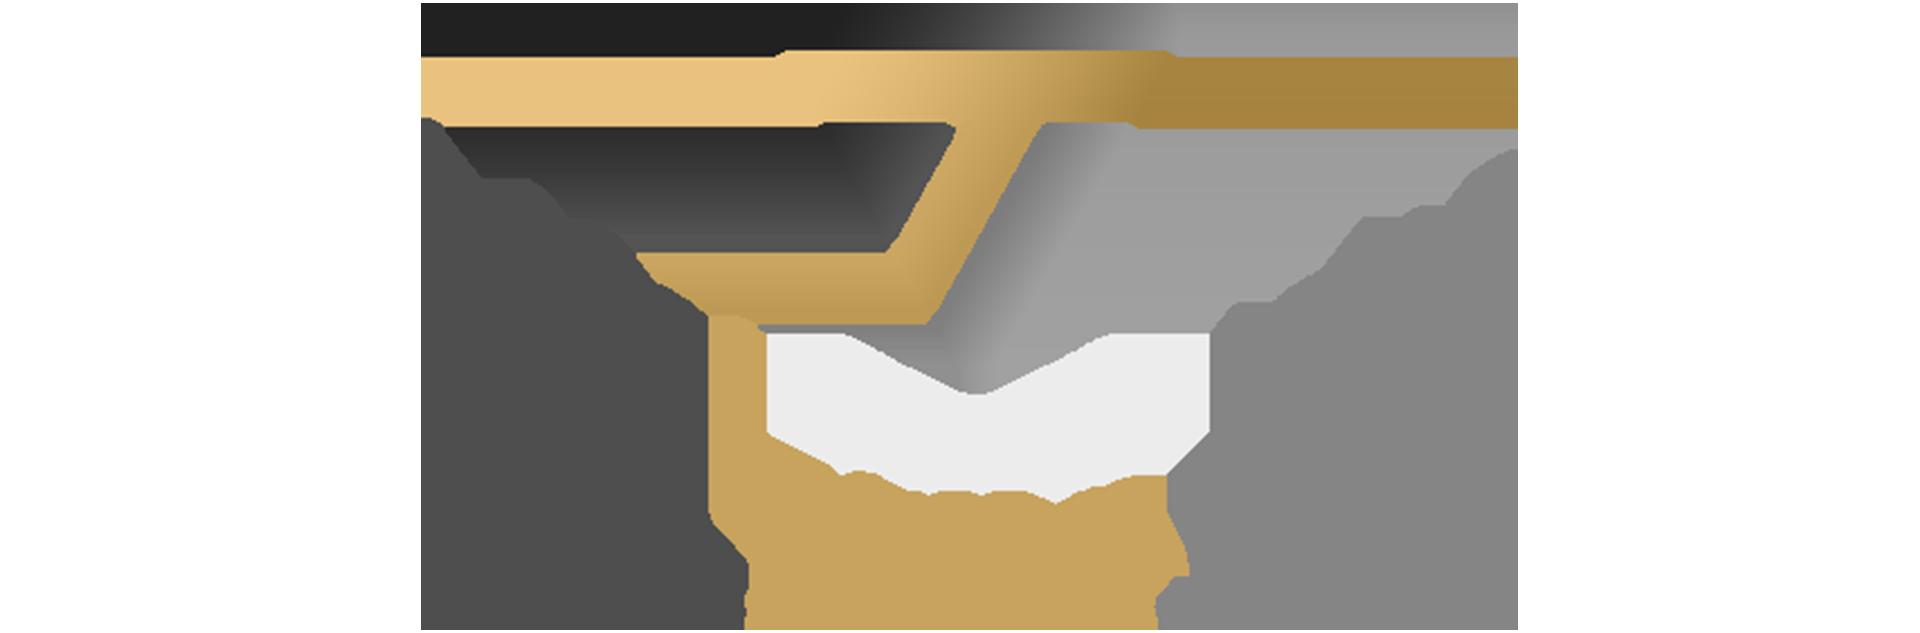 Life Time Jobs Steiermark - Ihr regionaler Payment Experte